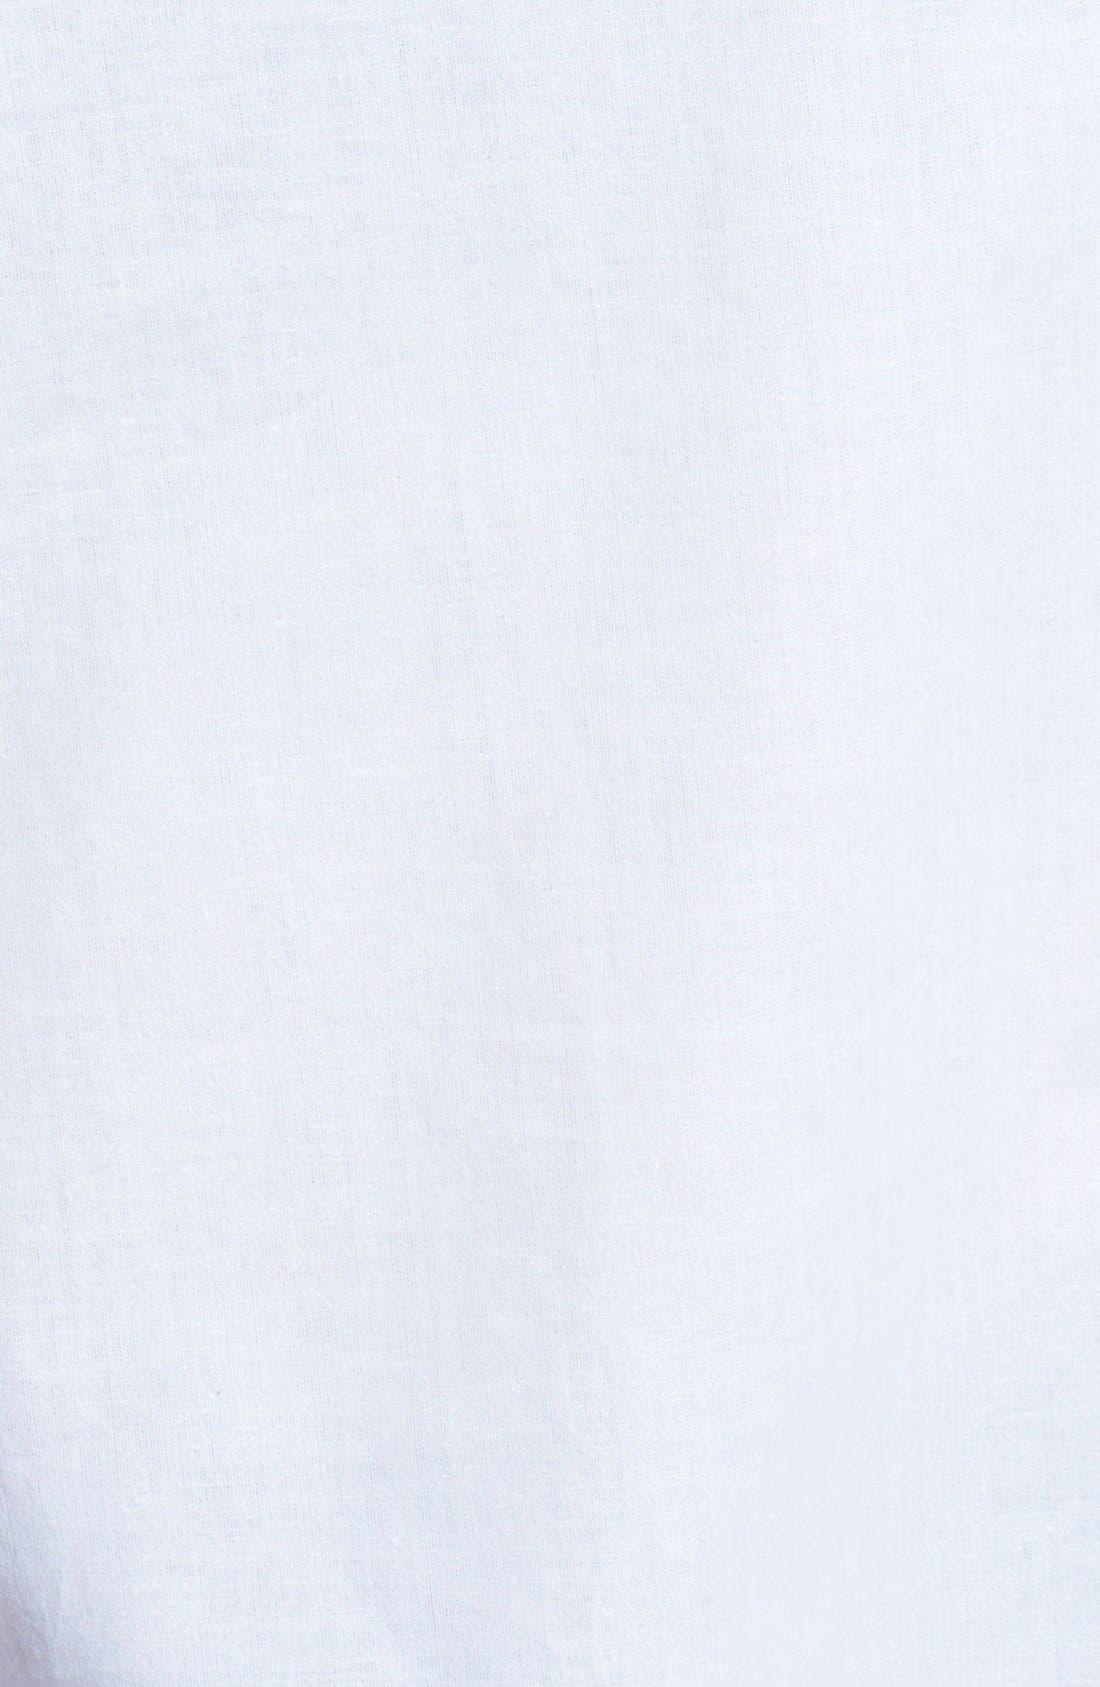 Alternate Image 3  - Anne Klein Lace-Up Cotton Top (Plus Size)